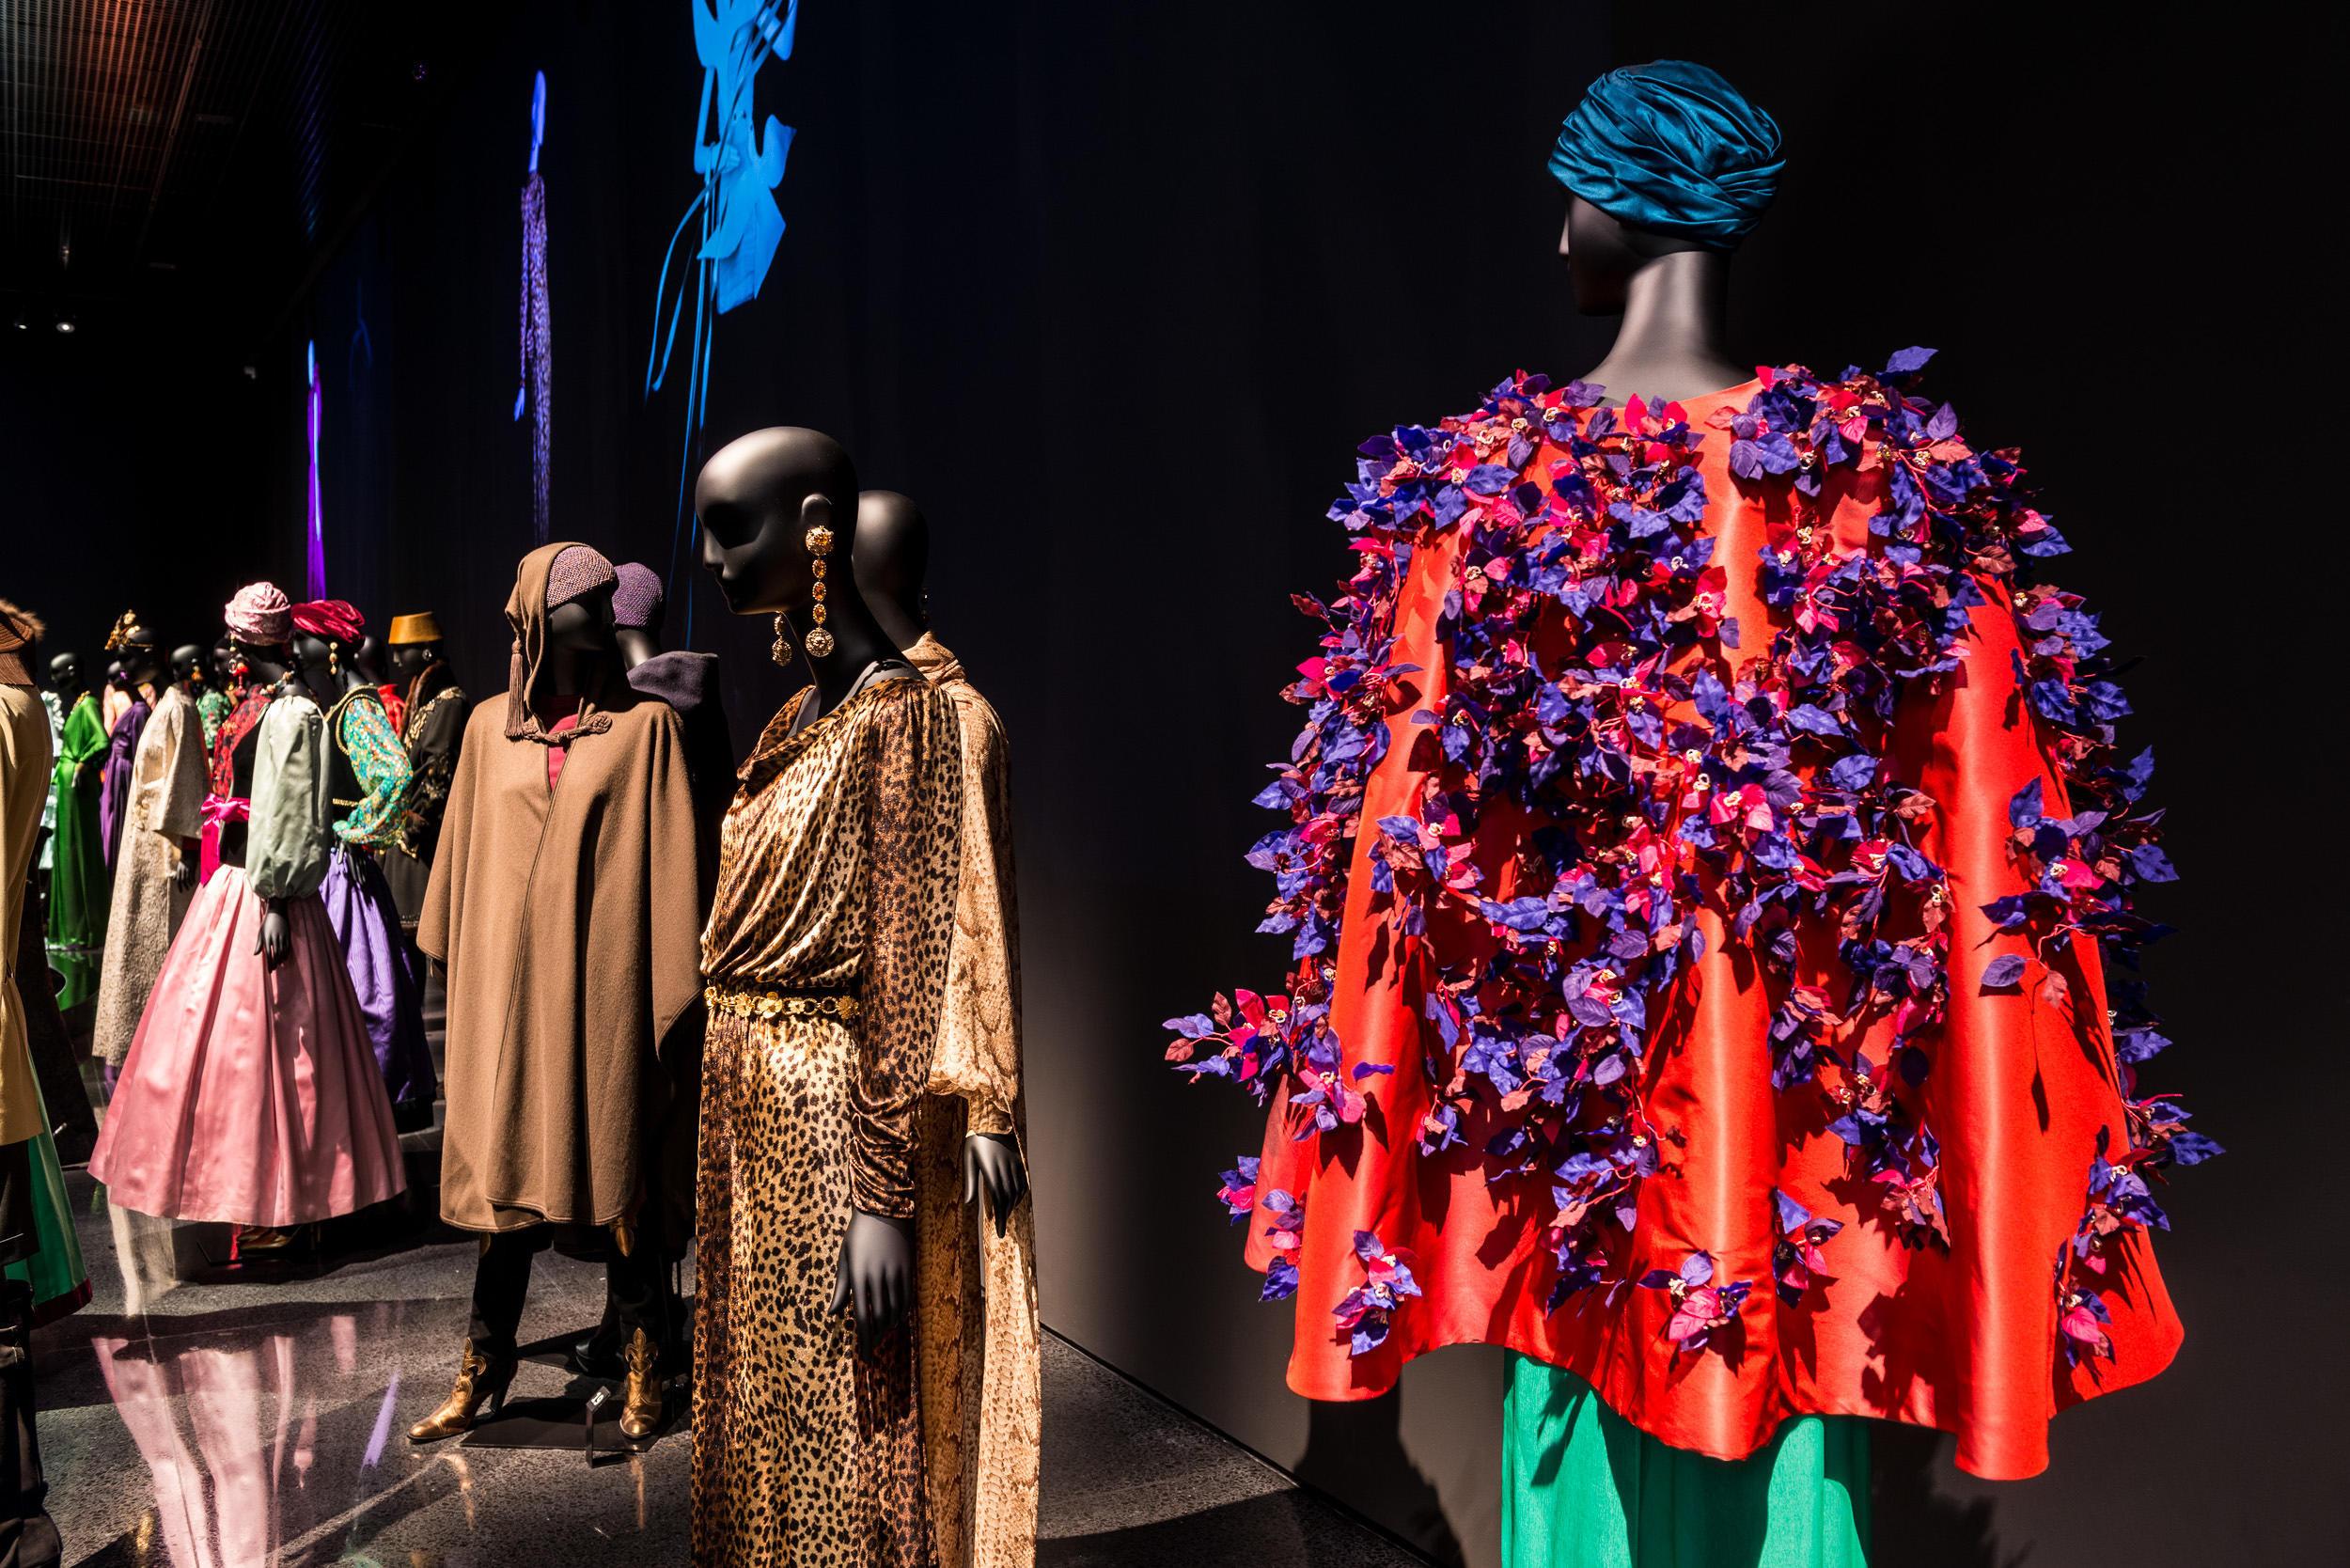 17 Genial Abendkleider Yves Saint Laurent Galerie Schön Abendkleider Yves Saint Laurent Vertrieb